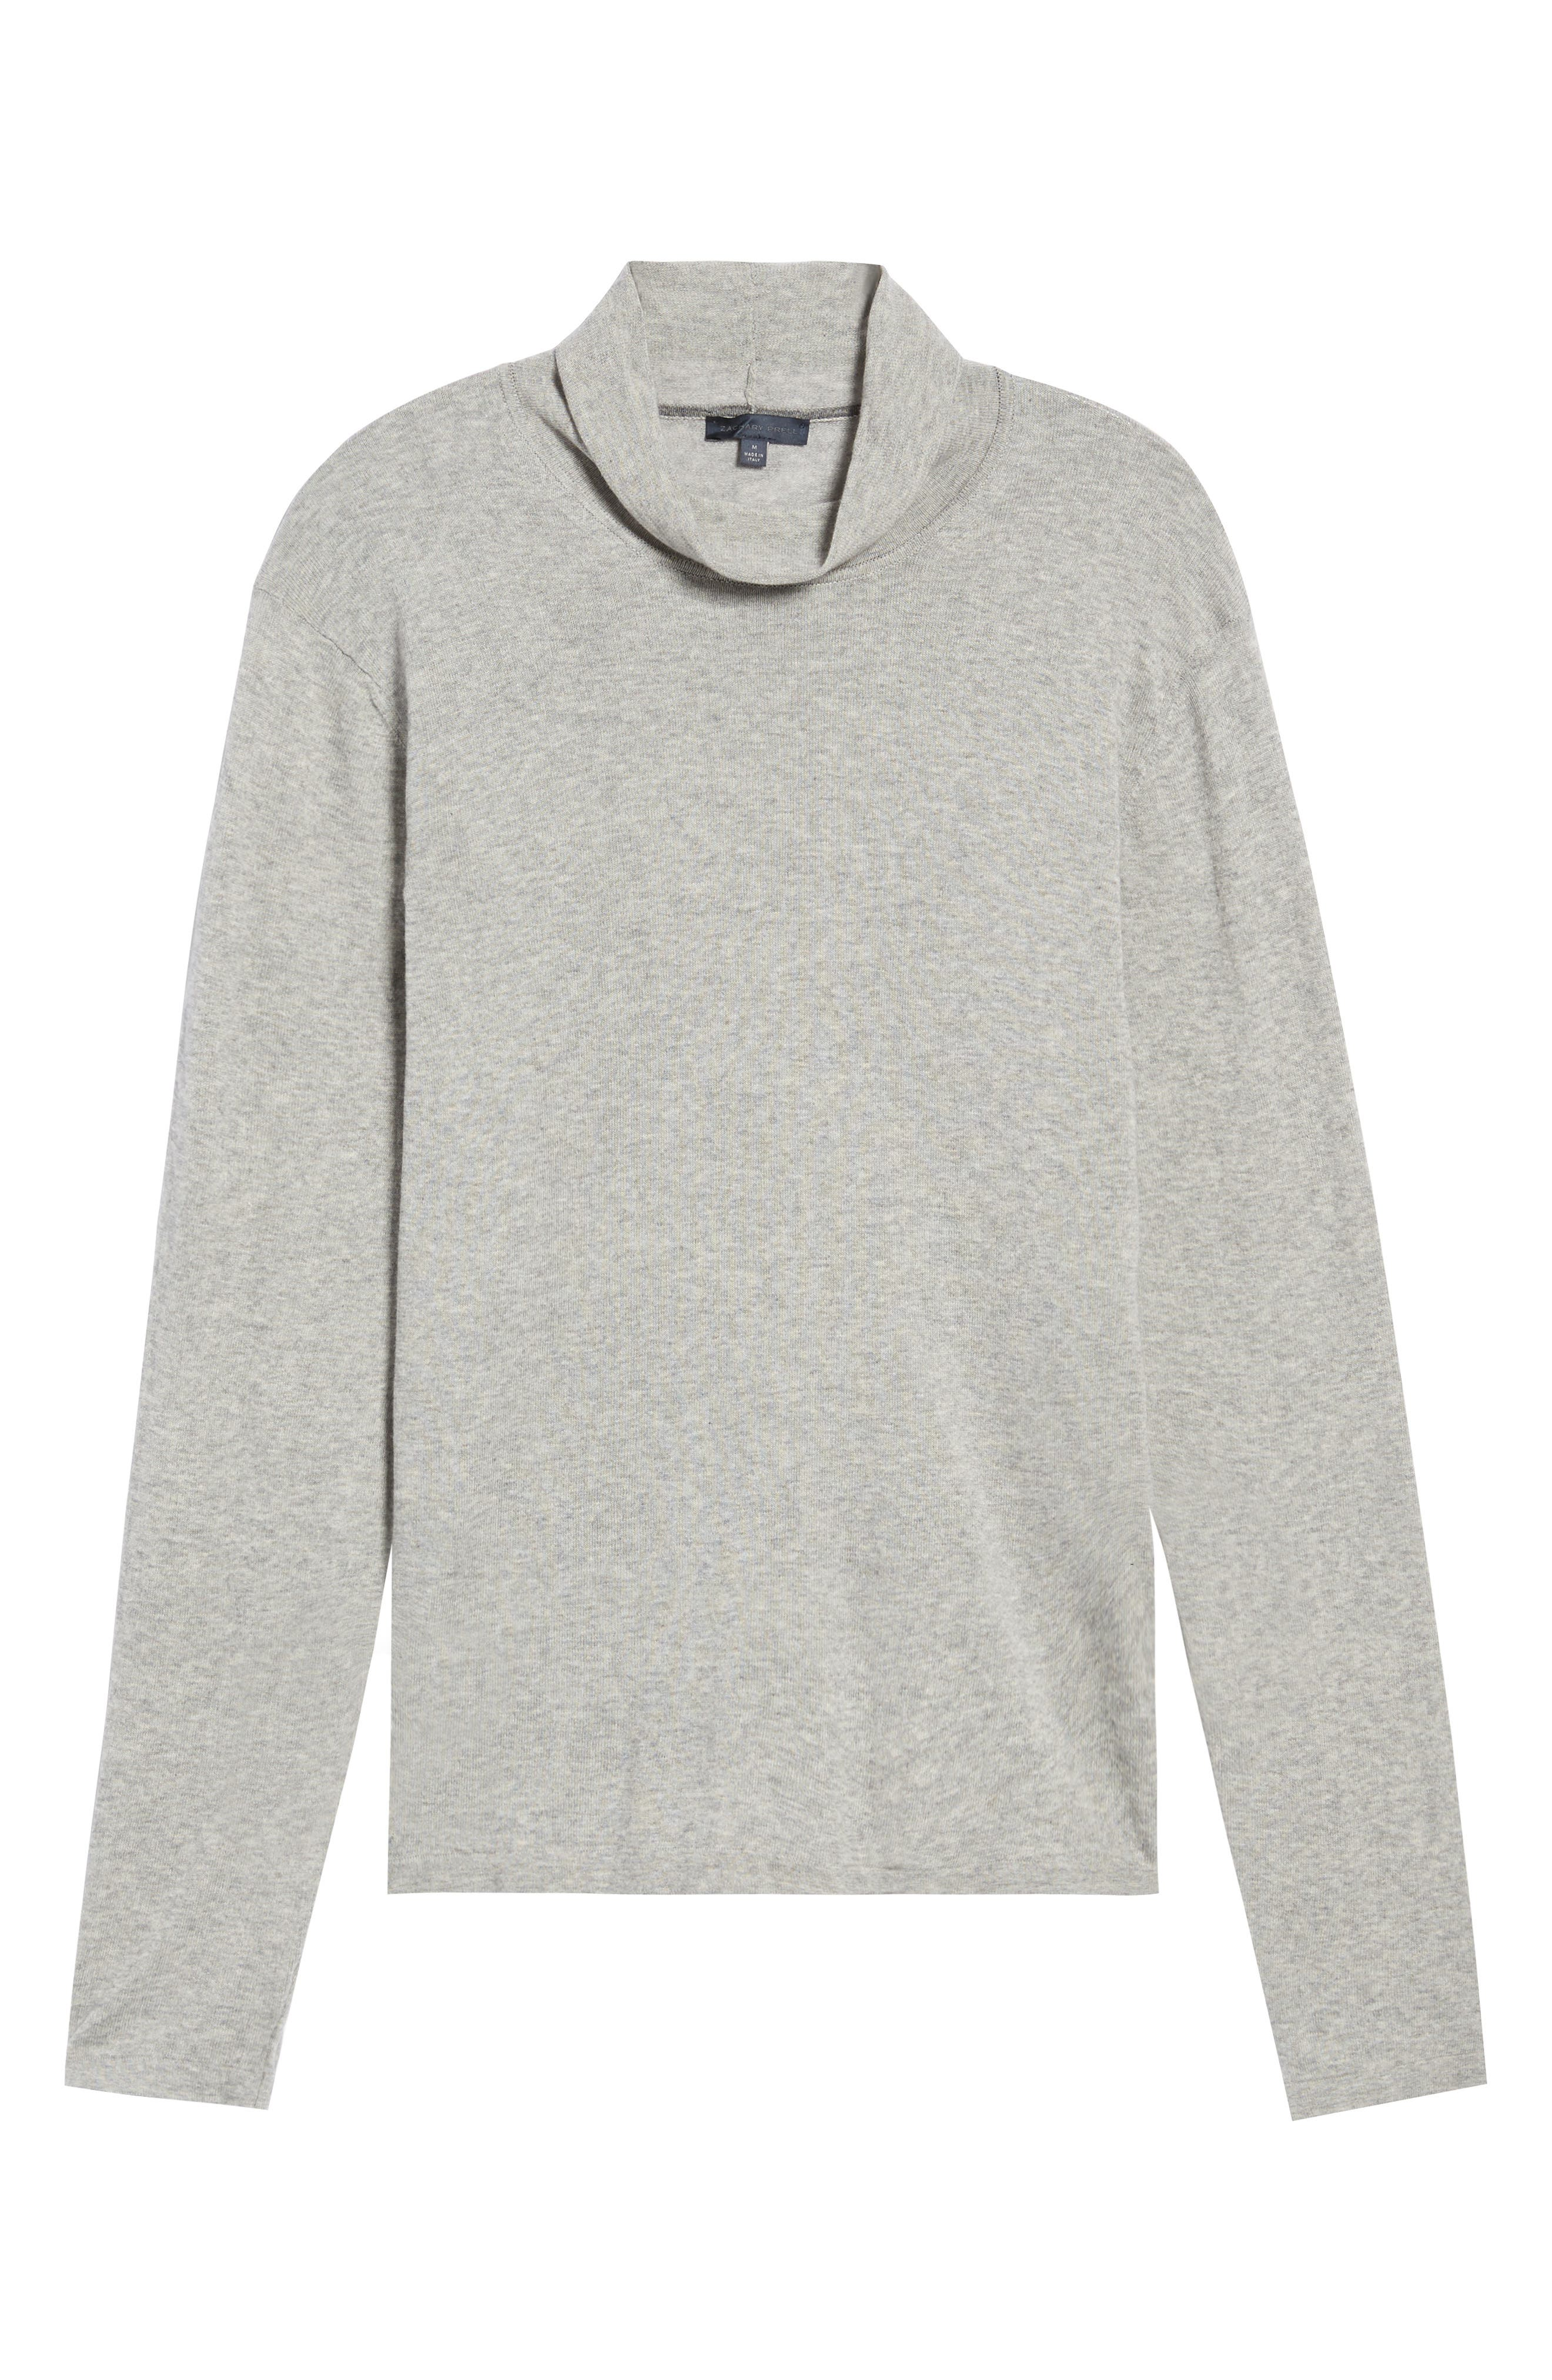 Hess Wool Turtleneck Sweater,                             Alternate thumbnail 11, color,